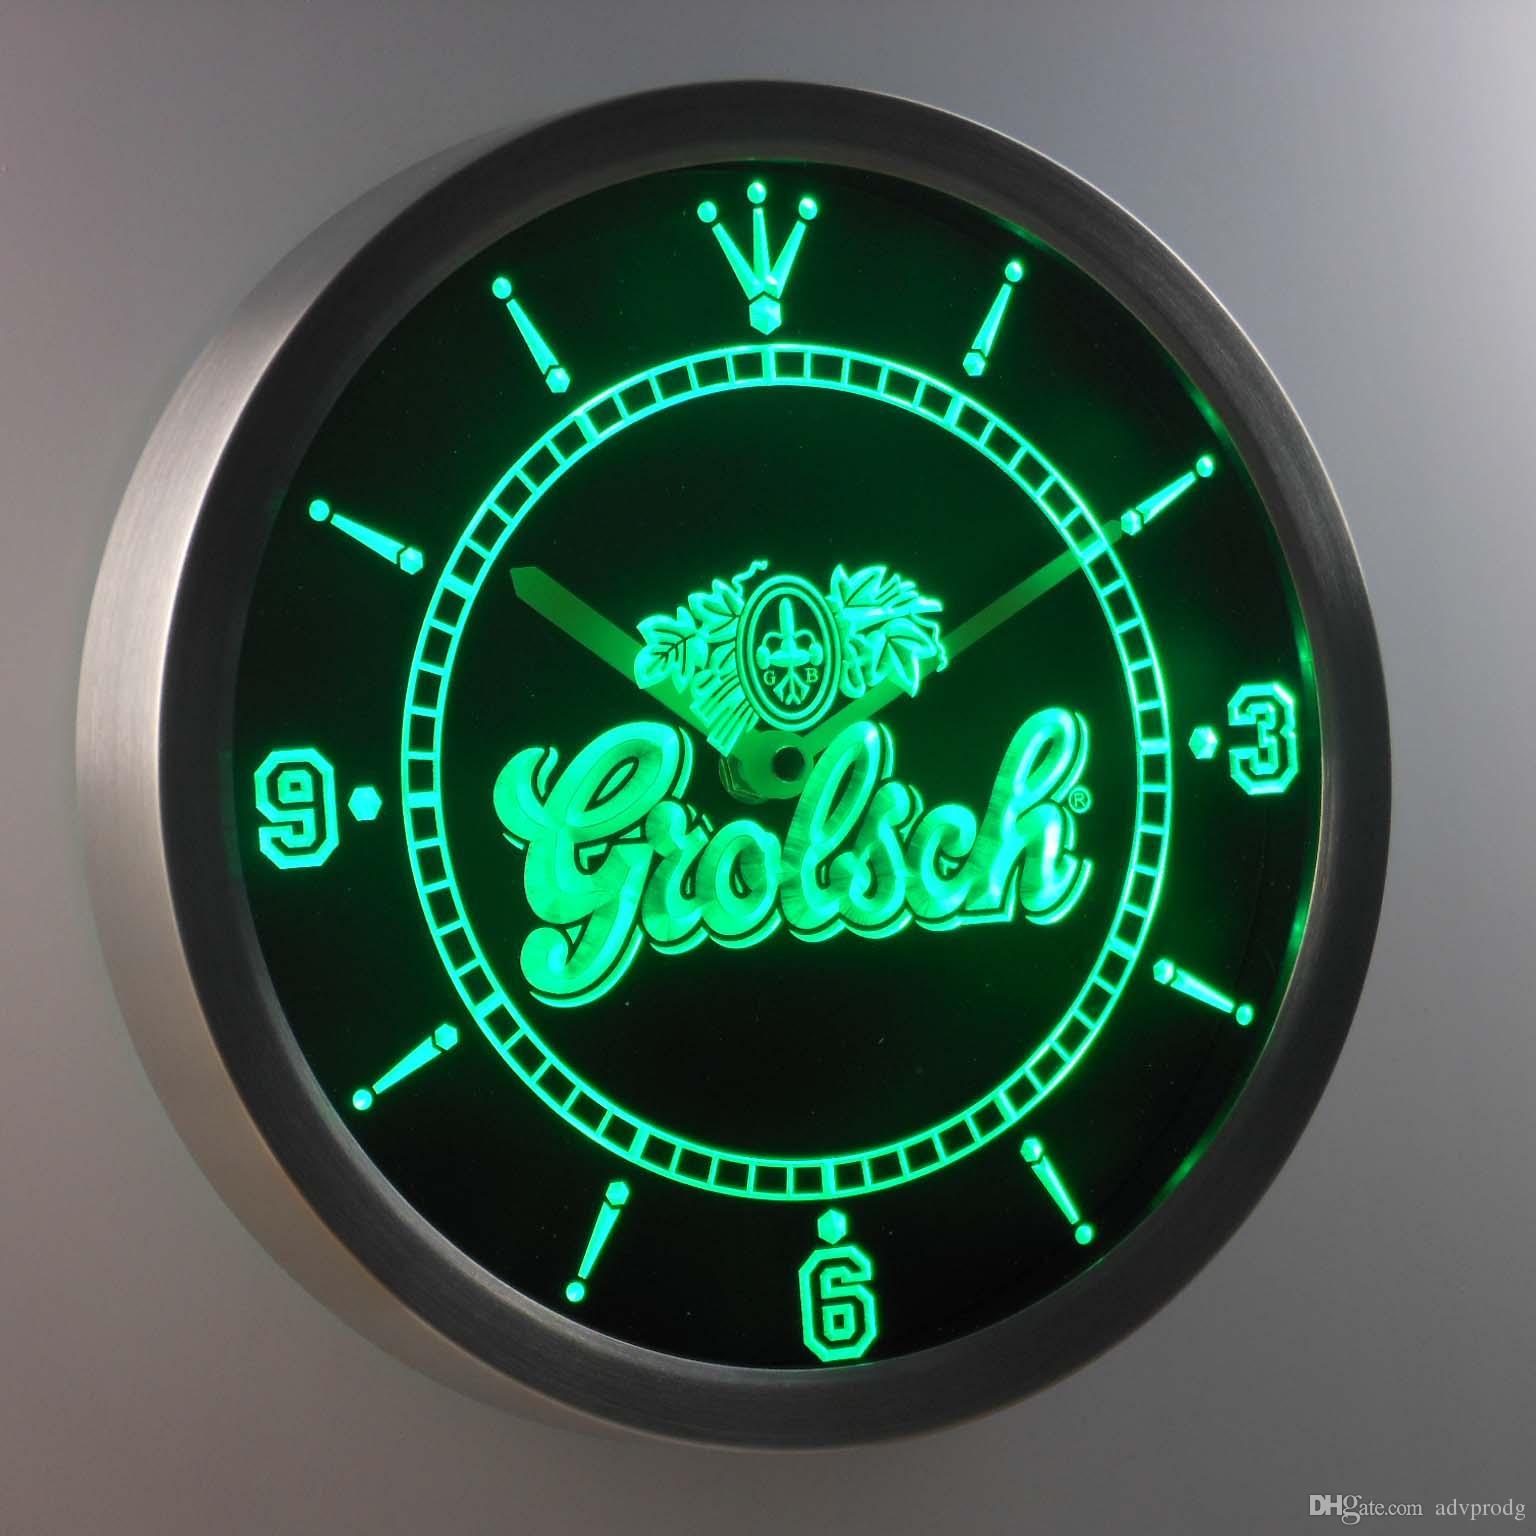 nc0002 grolsch luminova neon sign bar beer decor led wall clock